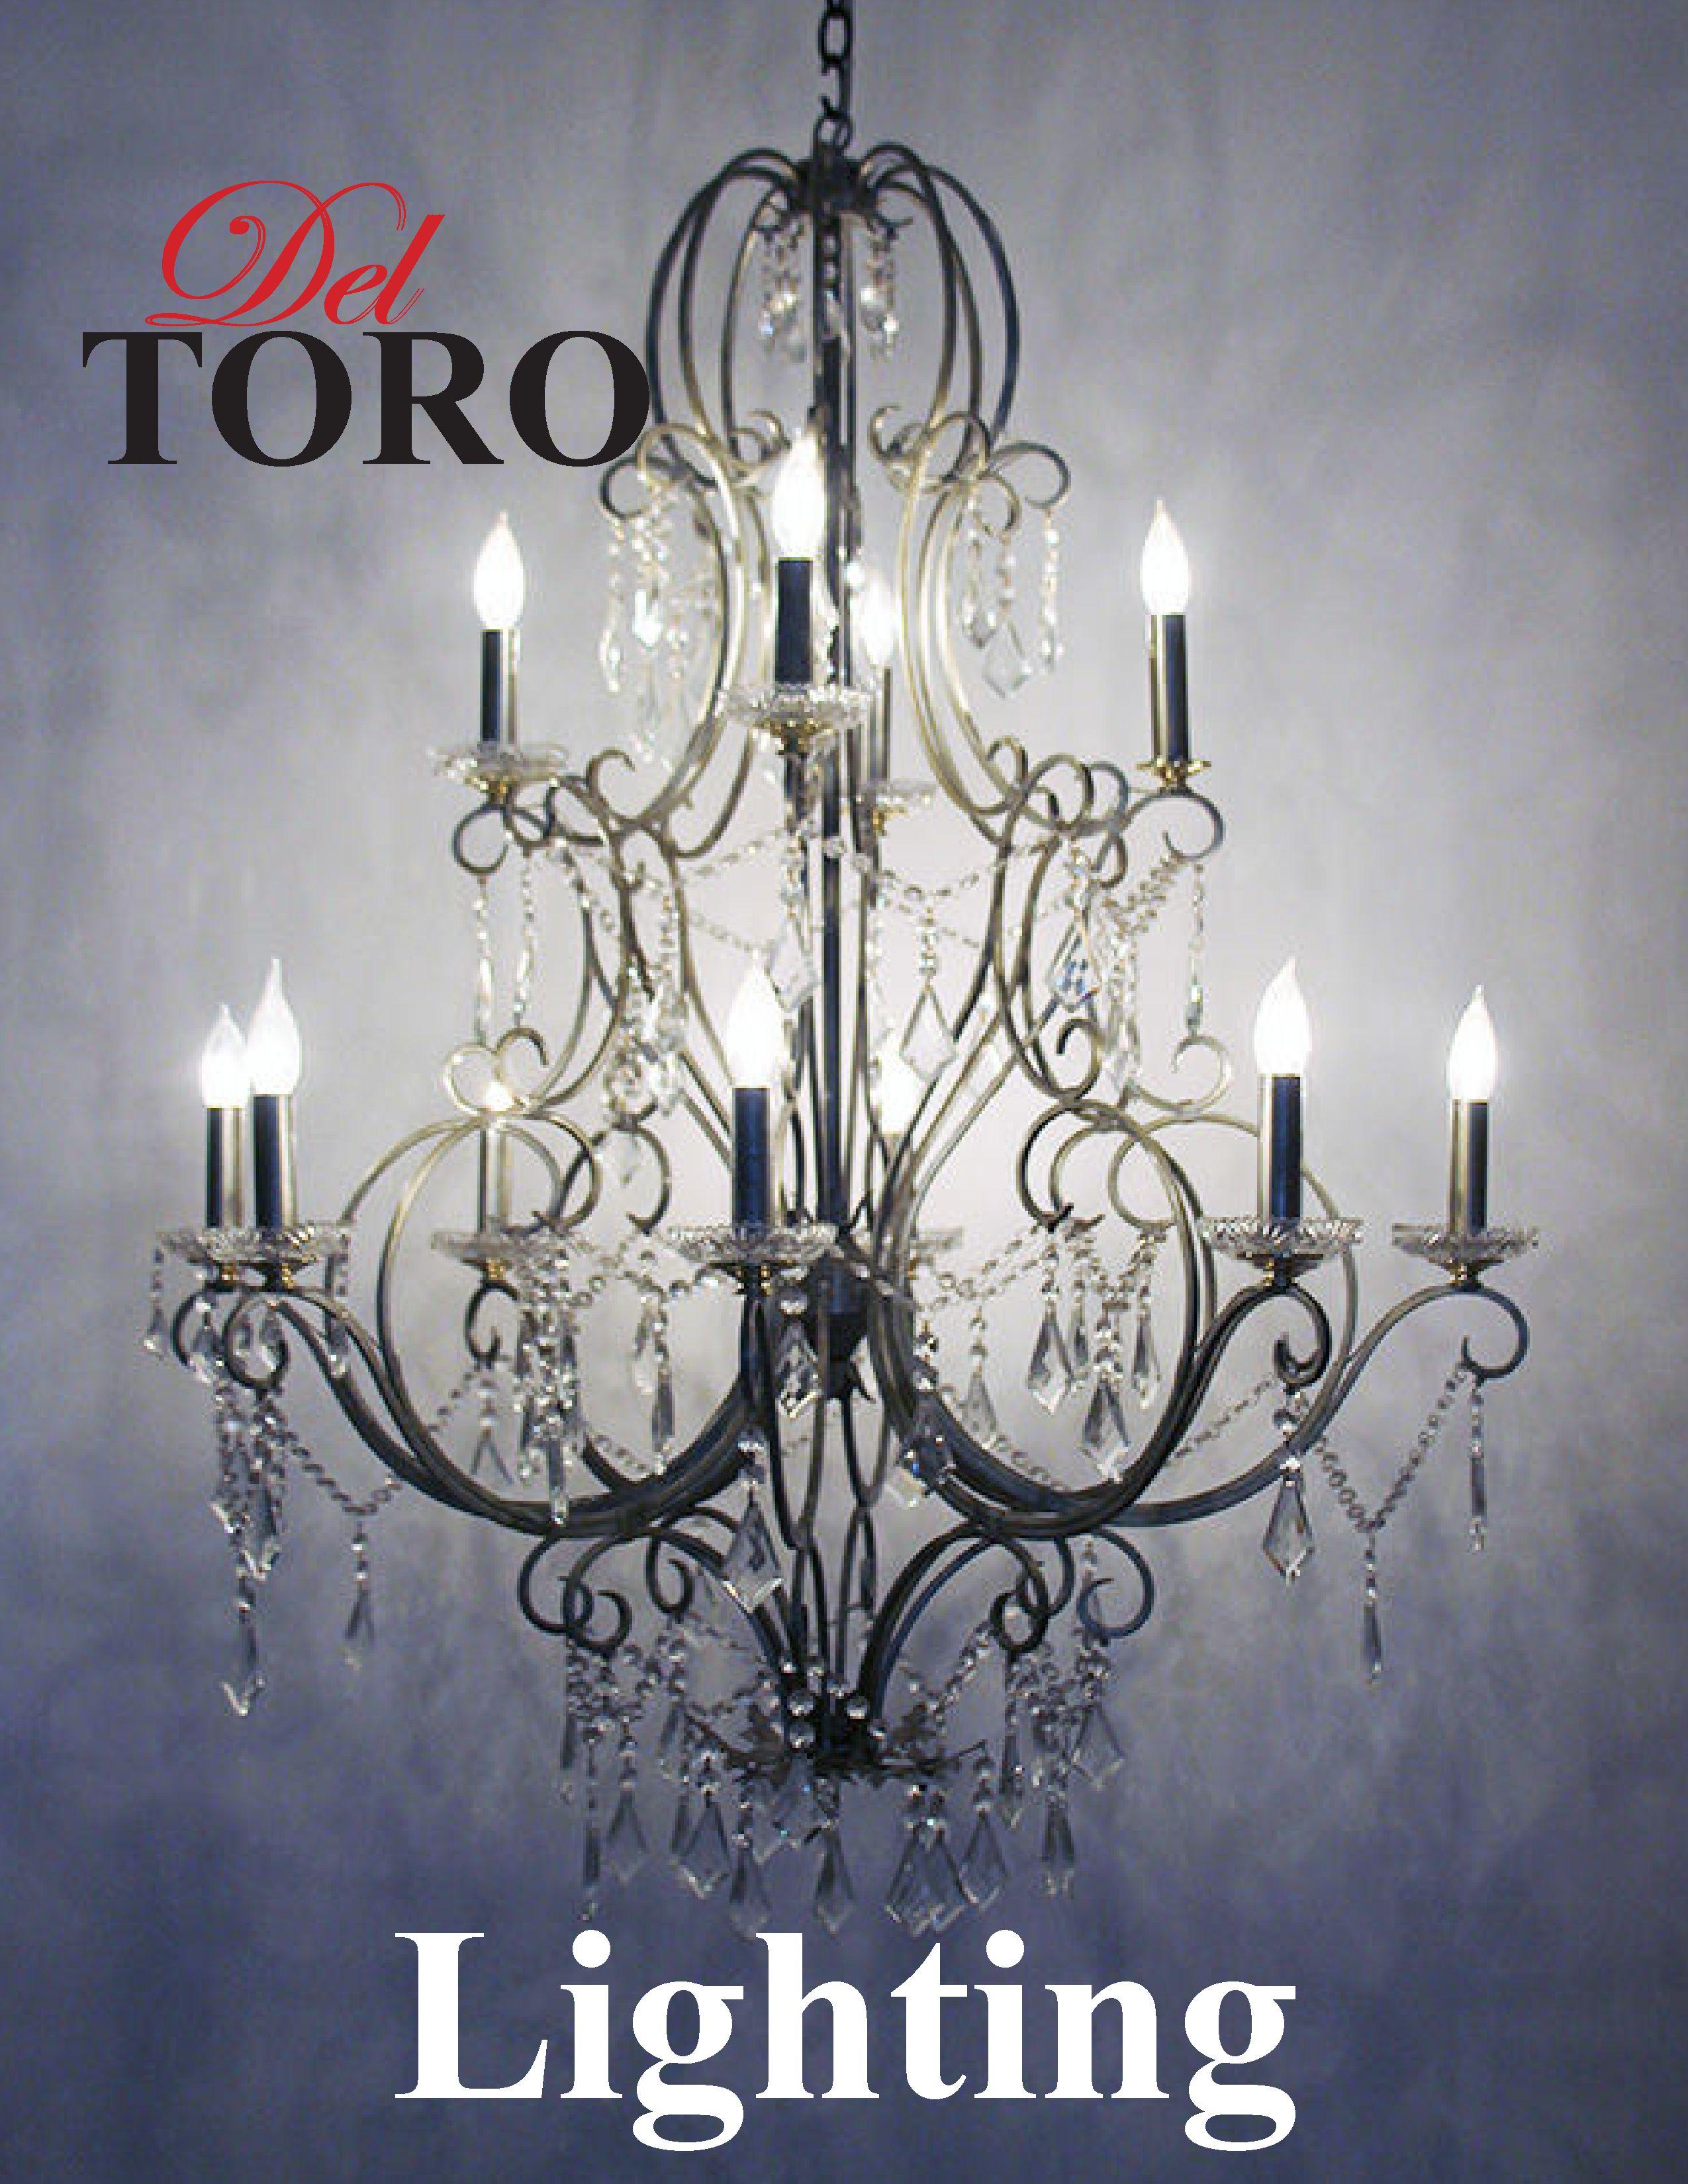 https://0201.nccdn.net/1_2/000/000/0ab/f46/Del-Toro-2013-Catalog_01.jpg